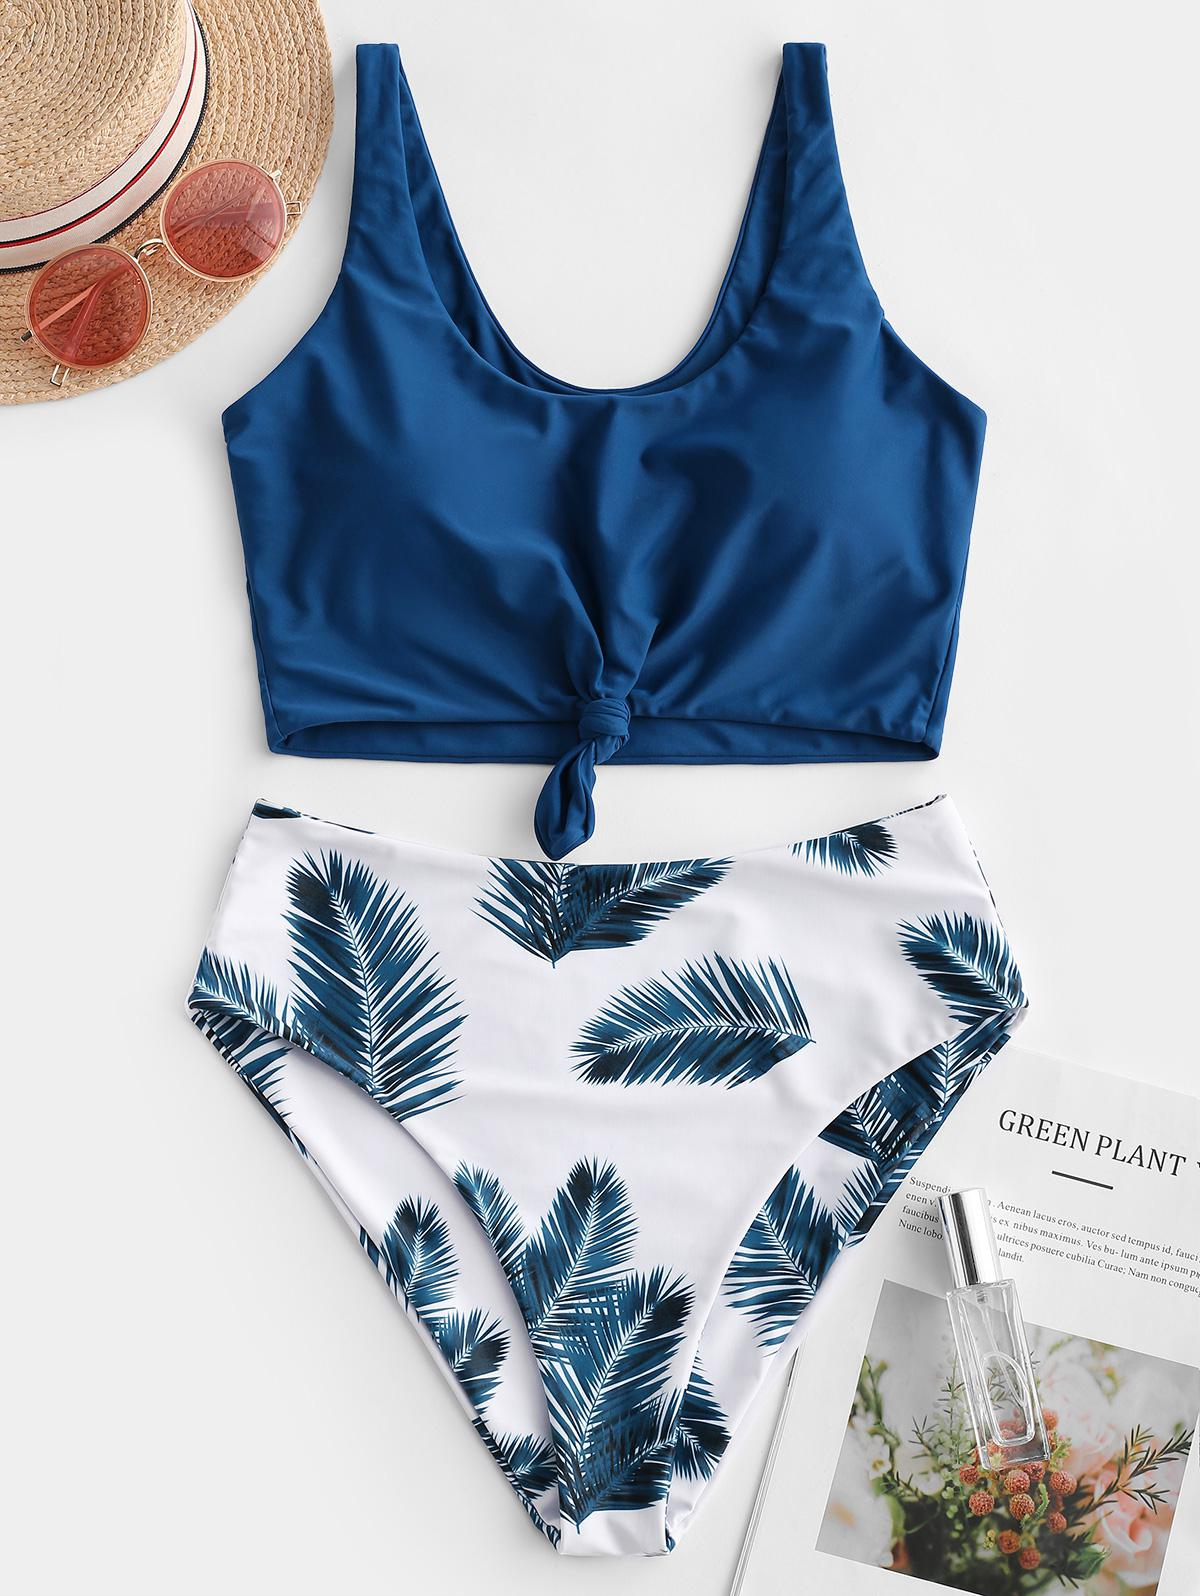 ZAFUL Leaf Print Knot Mix and Match Tankini Swimsuit, Lapis blue